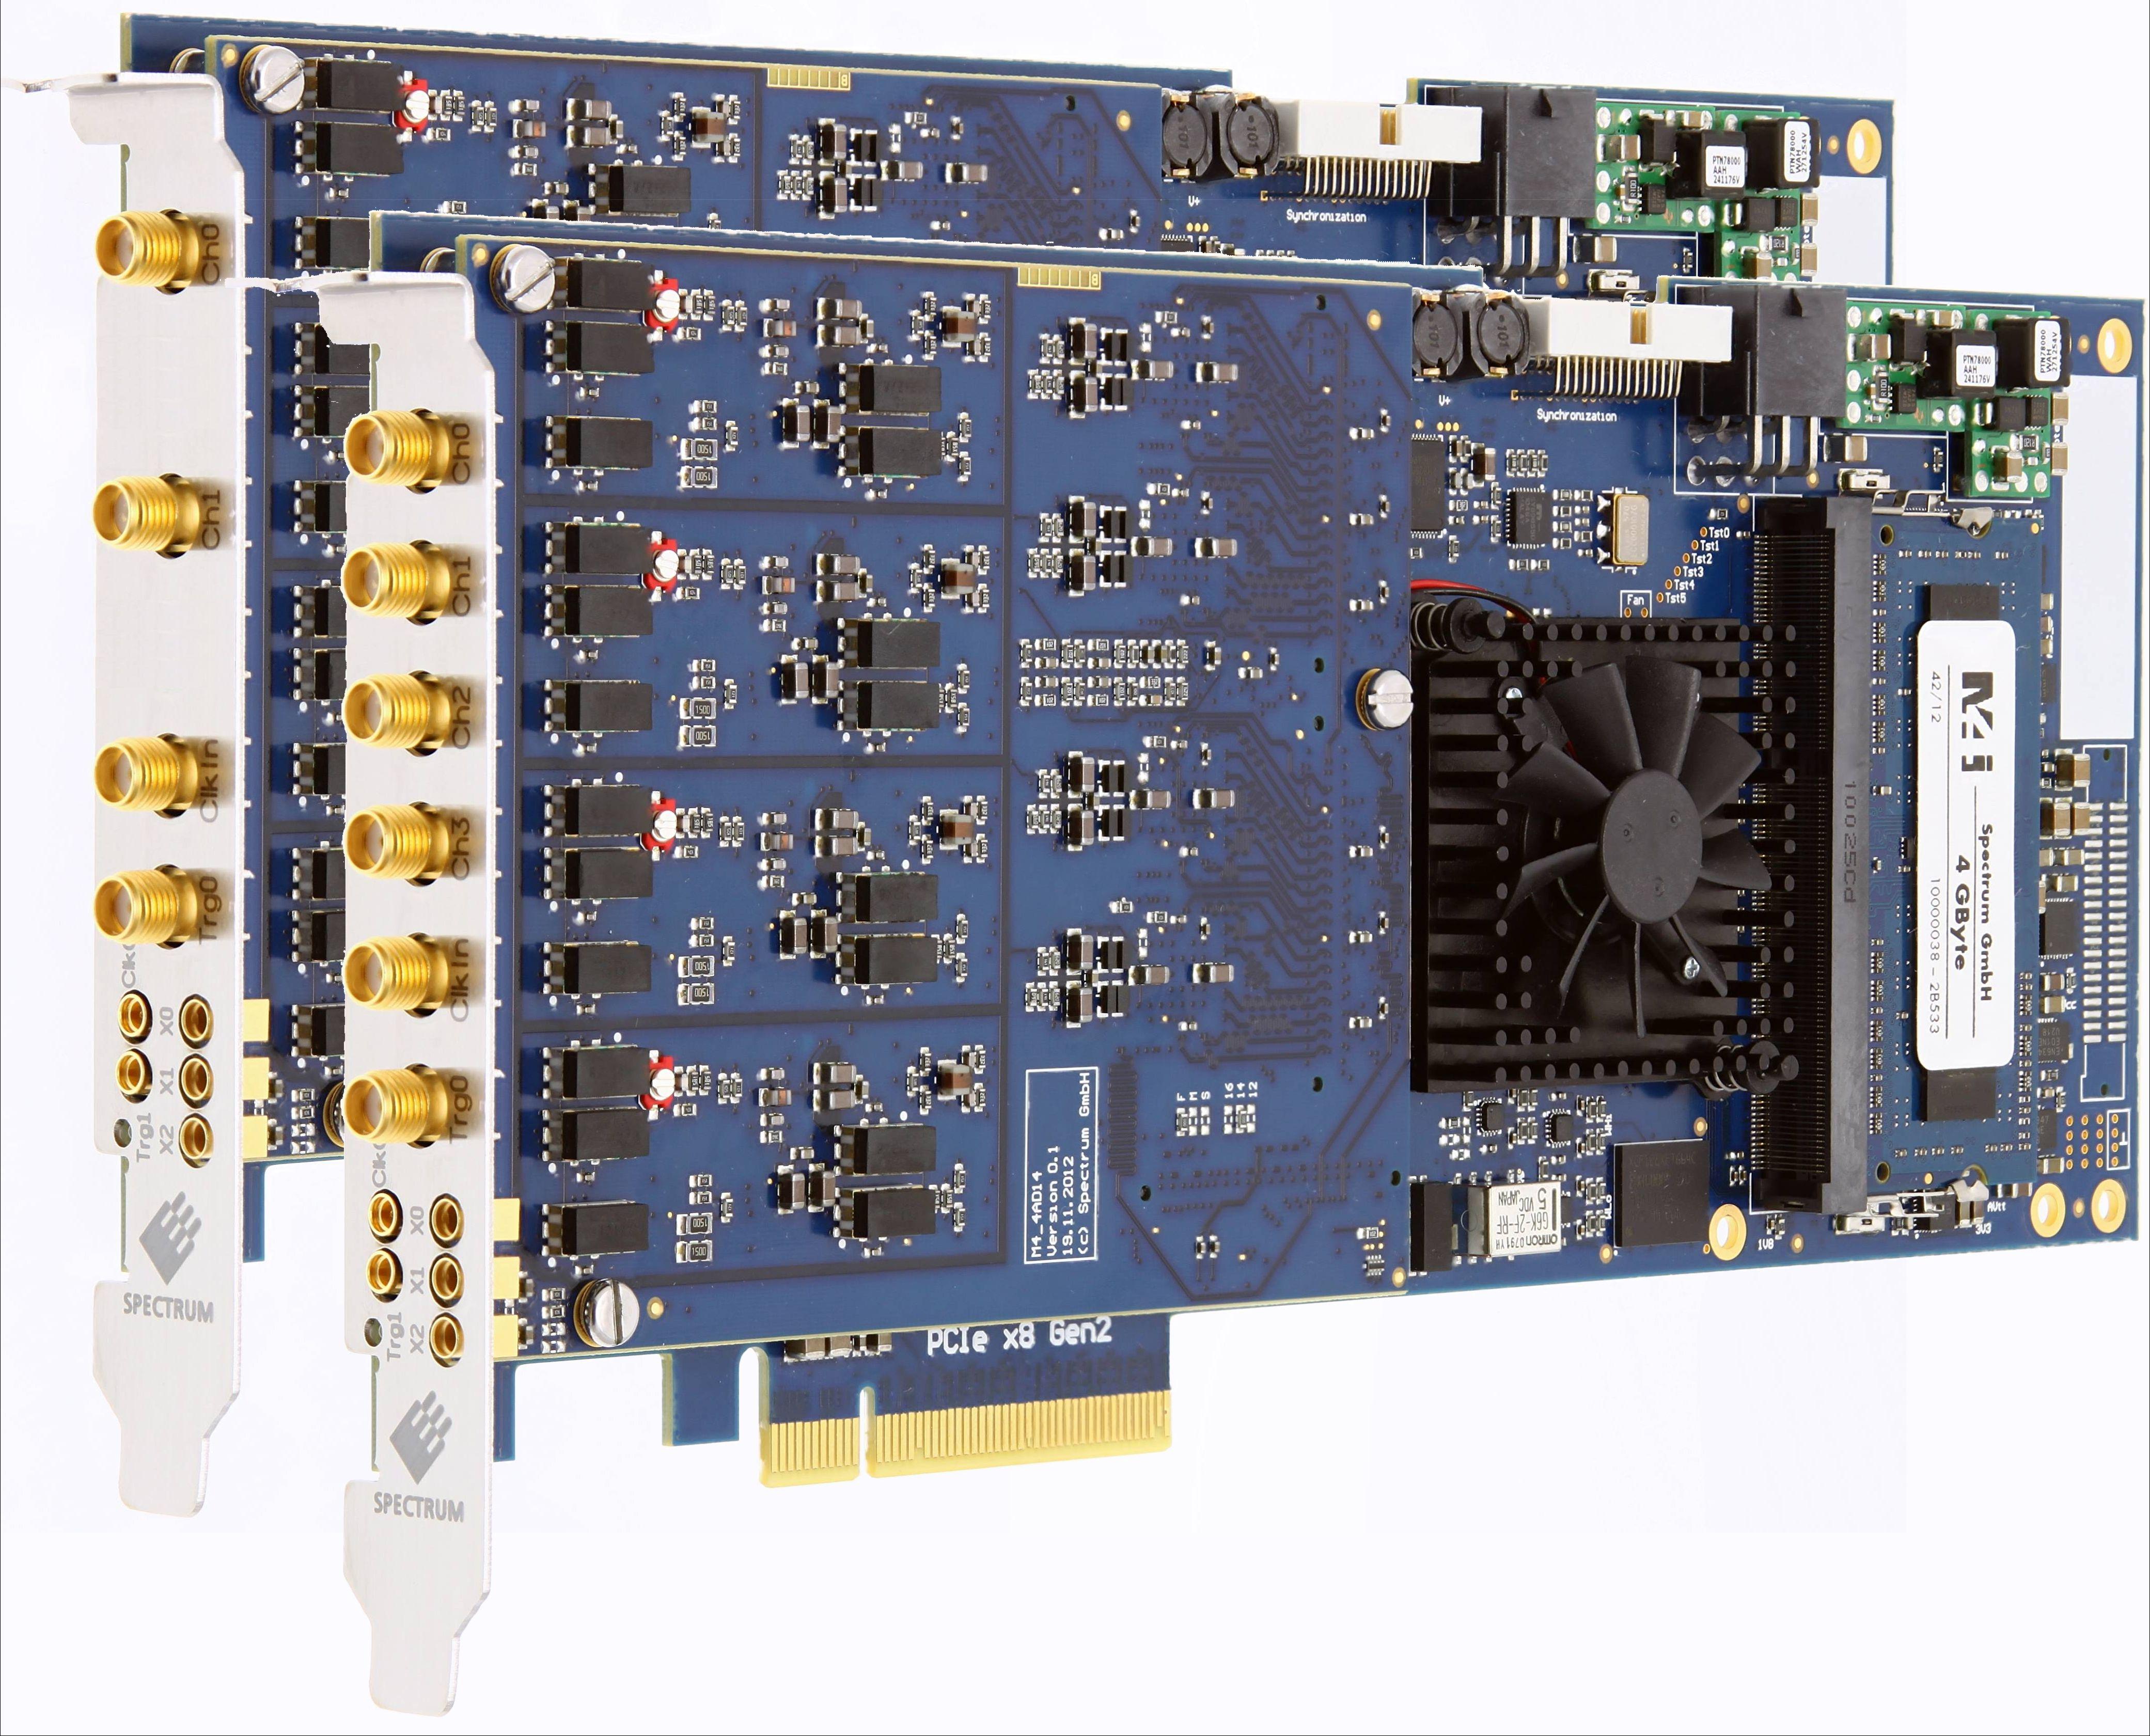 Spectrum M4i.441x-8 serie digitizer kaarten